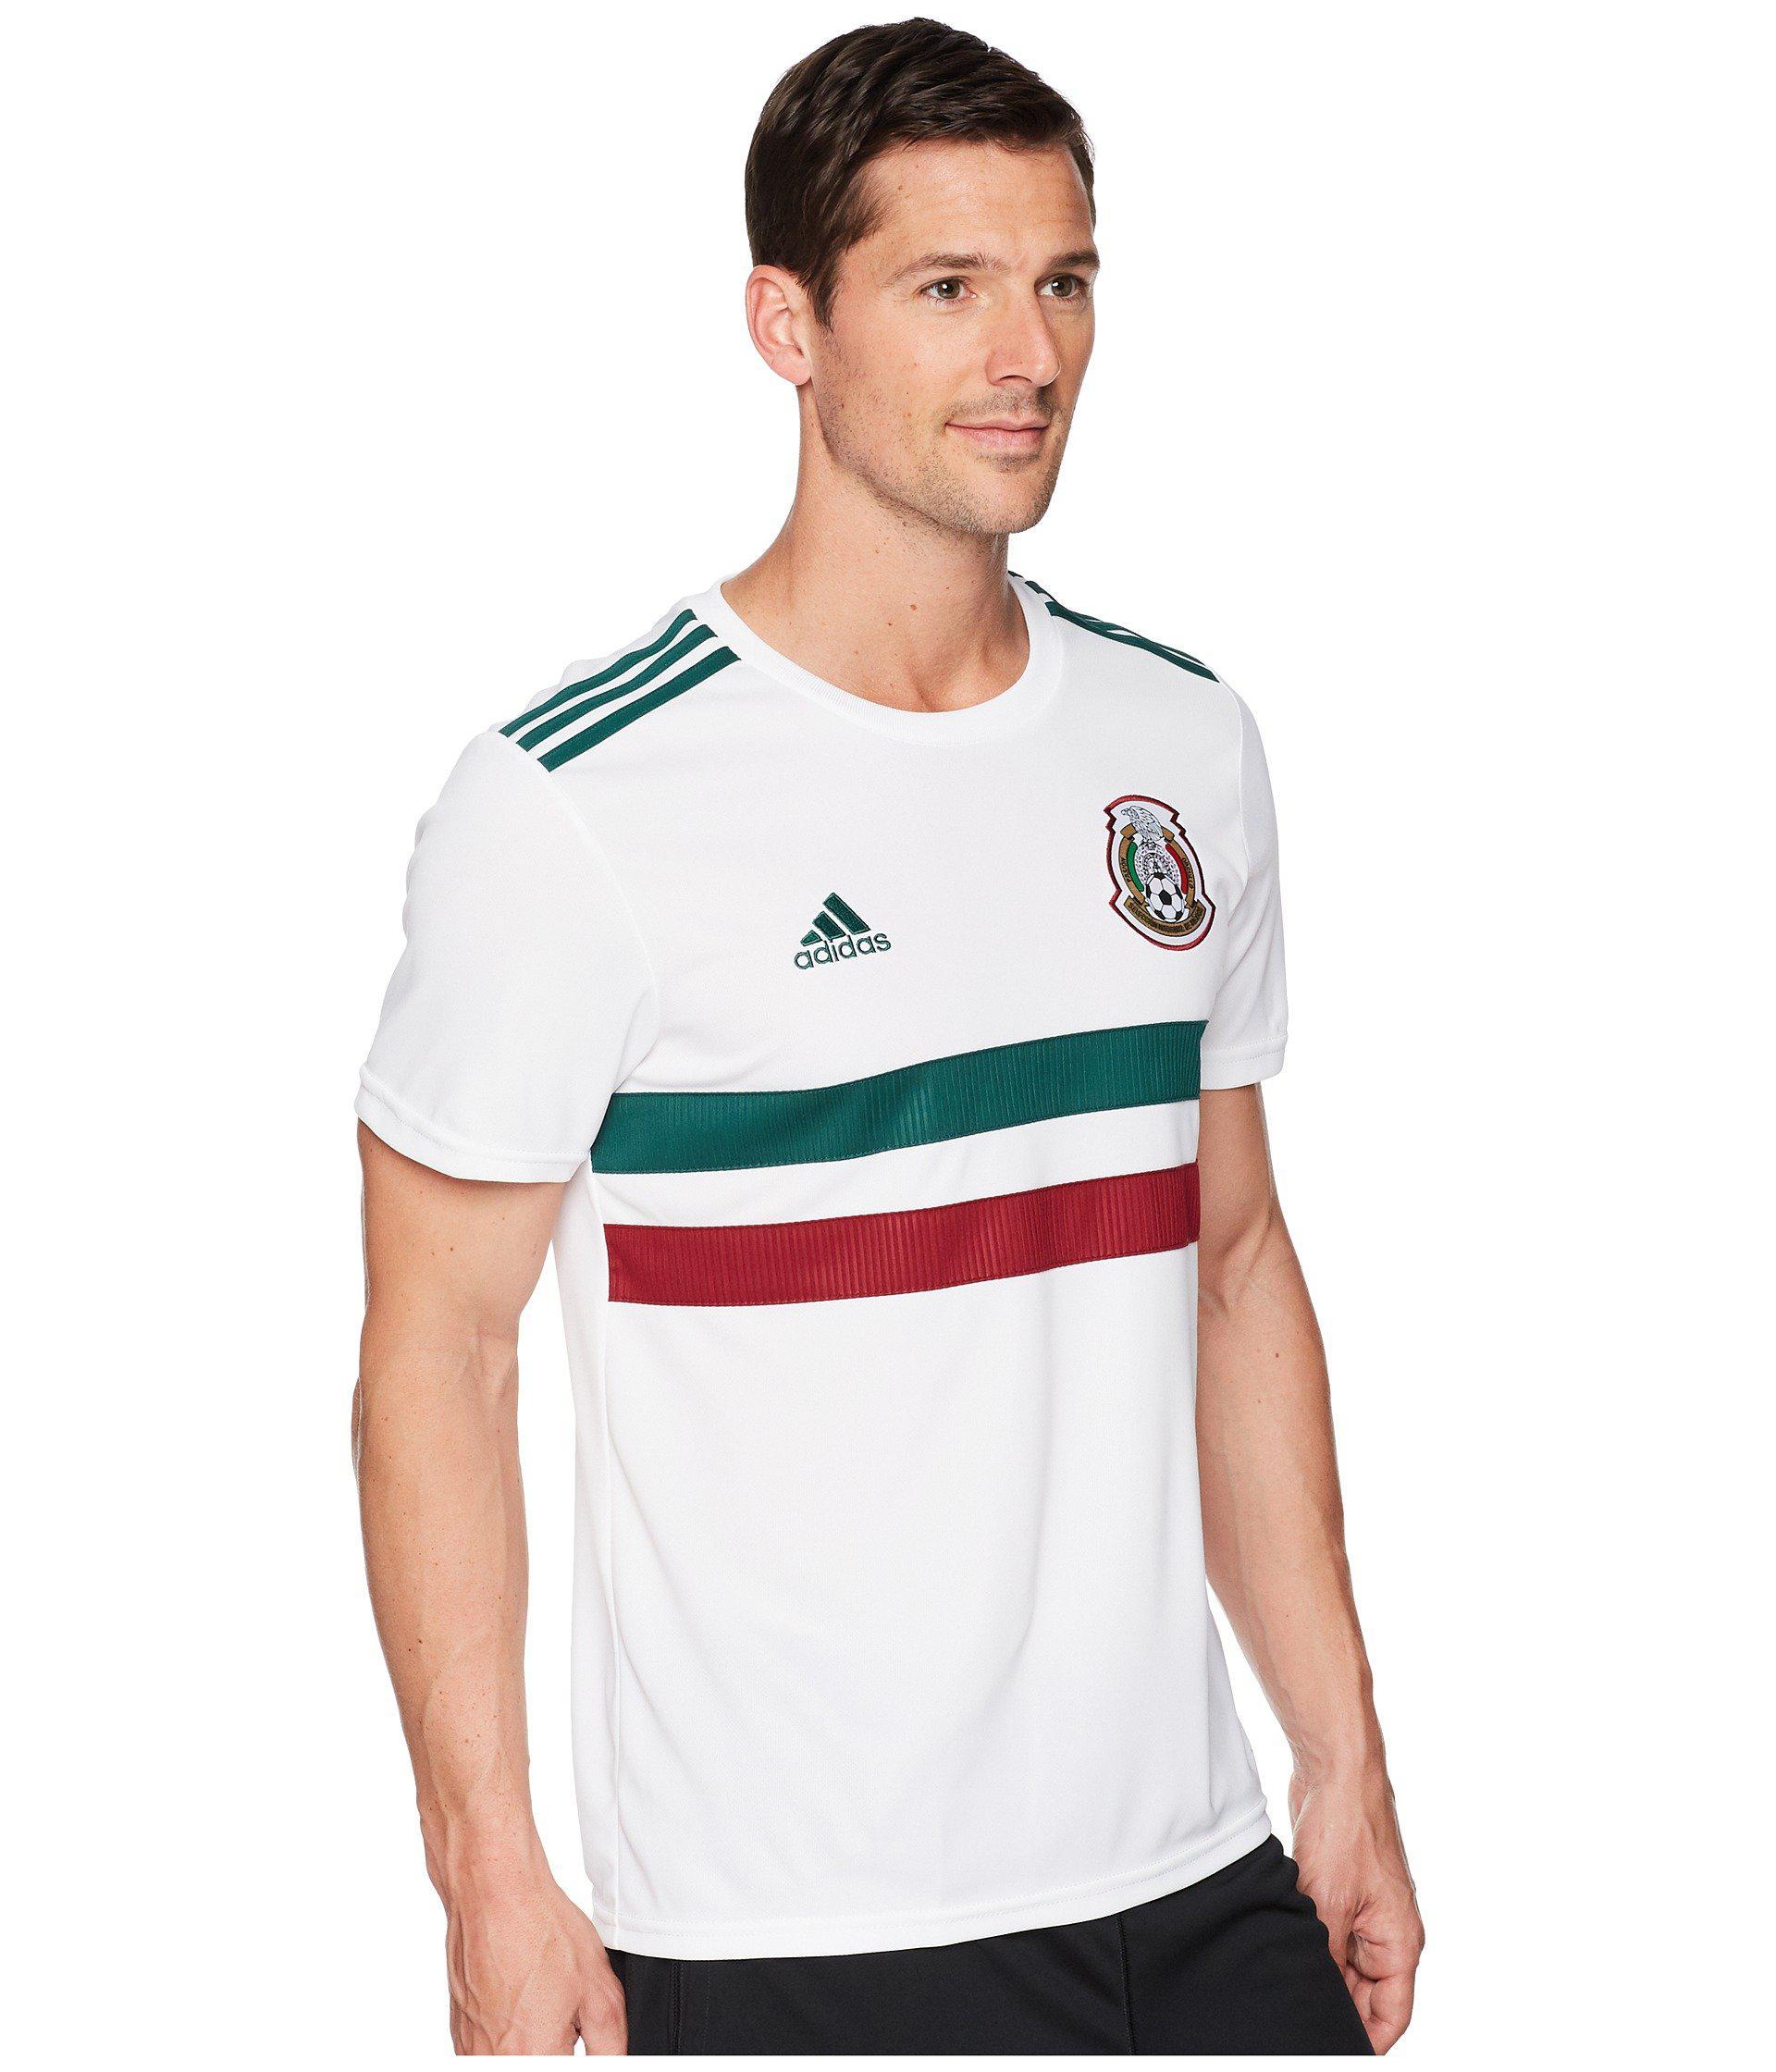 competitive price 844b2 a1e85 Men's White 2018 Mexico Away Replica Jersey